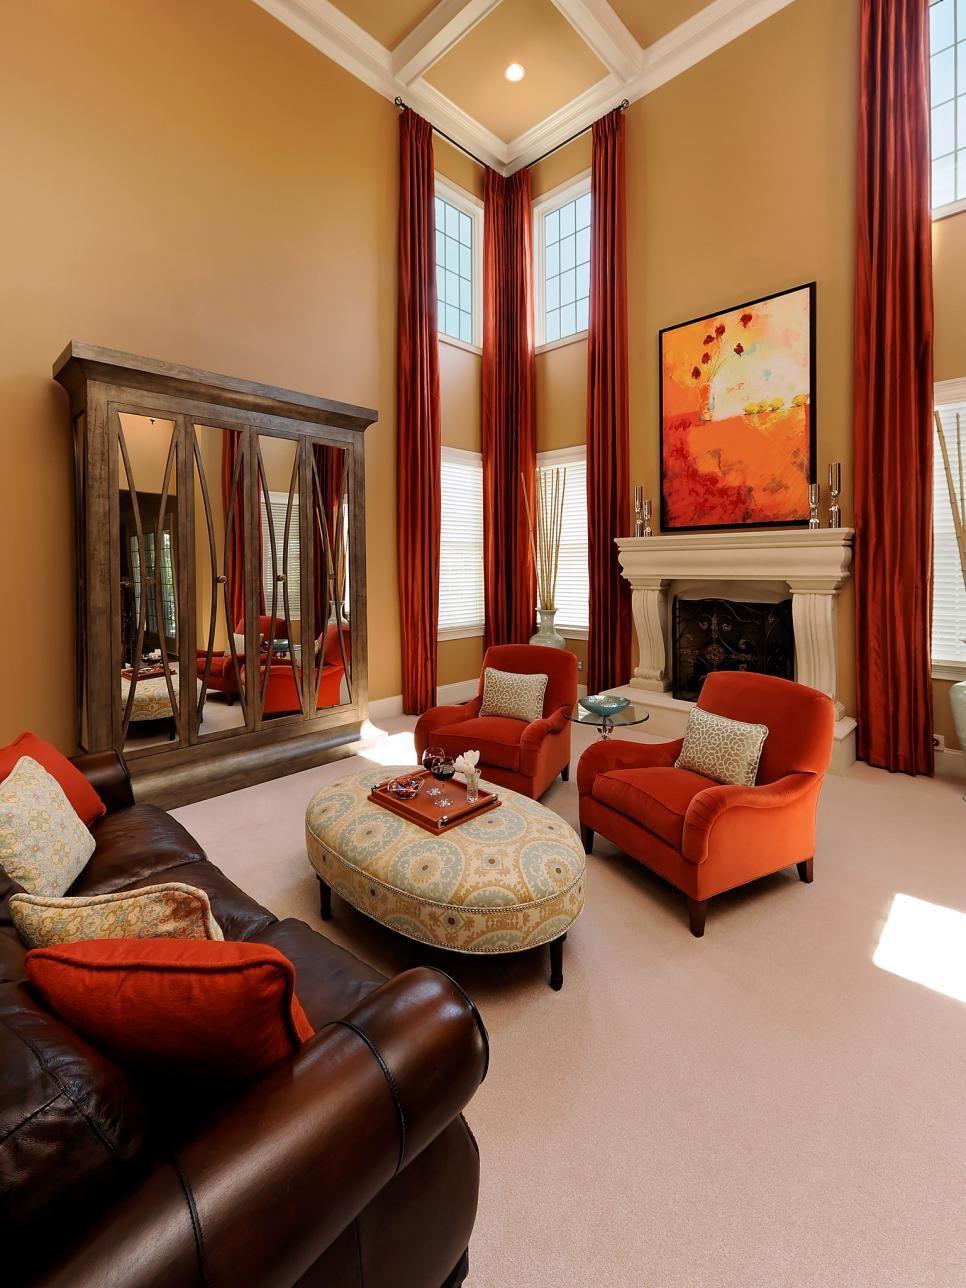 Best Home Staging Tips For Fall Living Room Orange Living 400 x 300